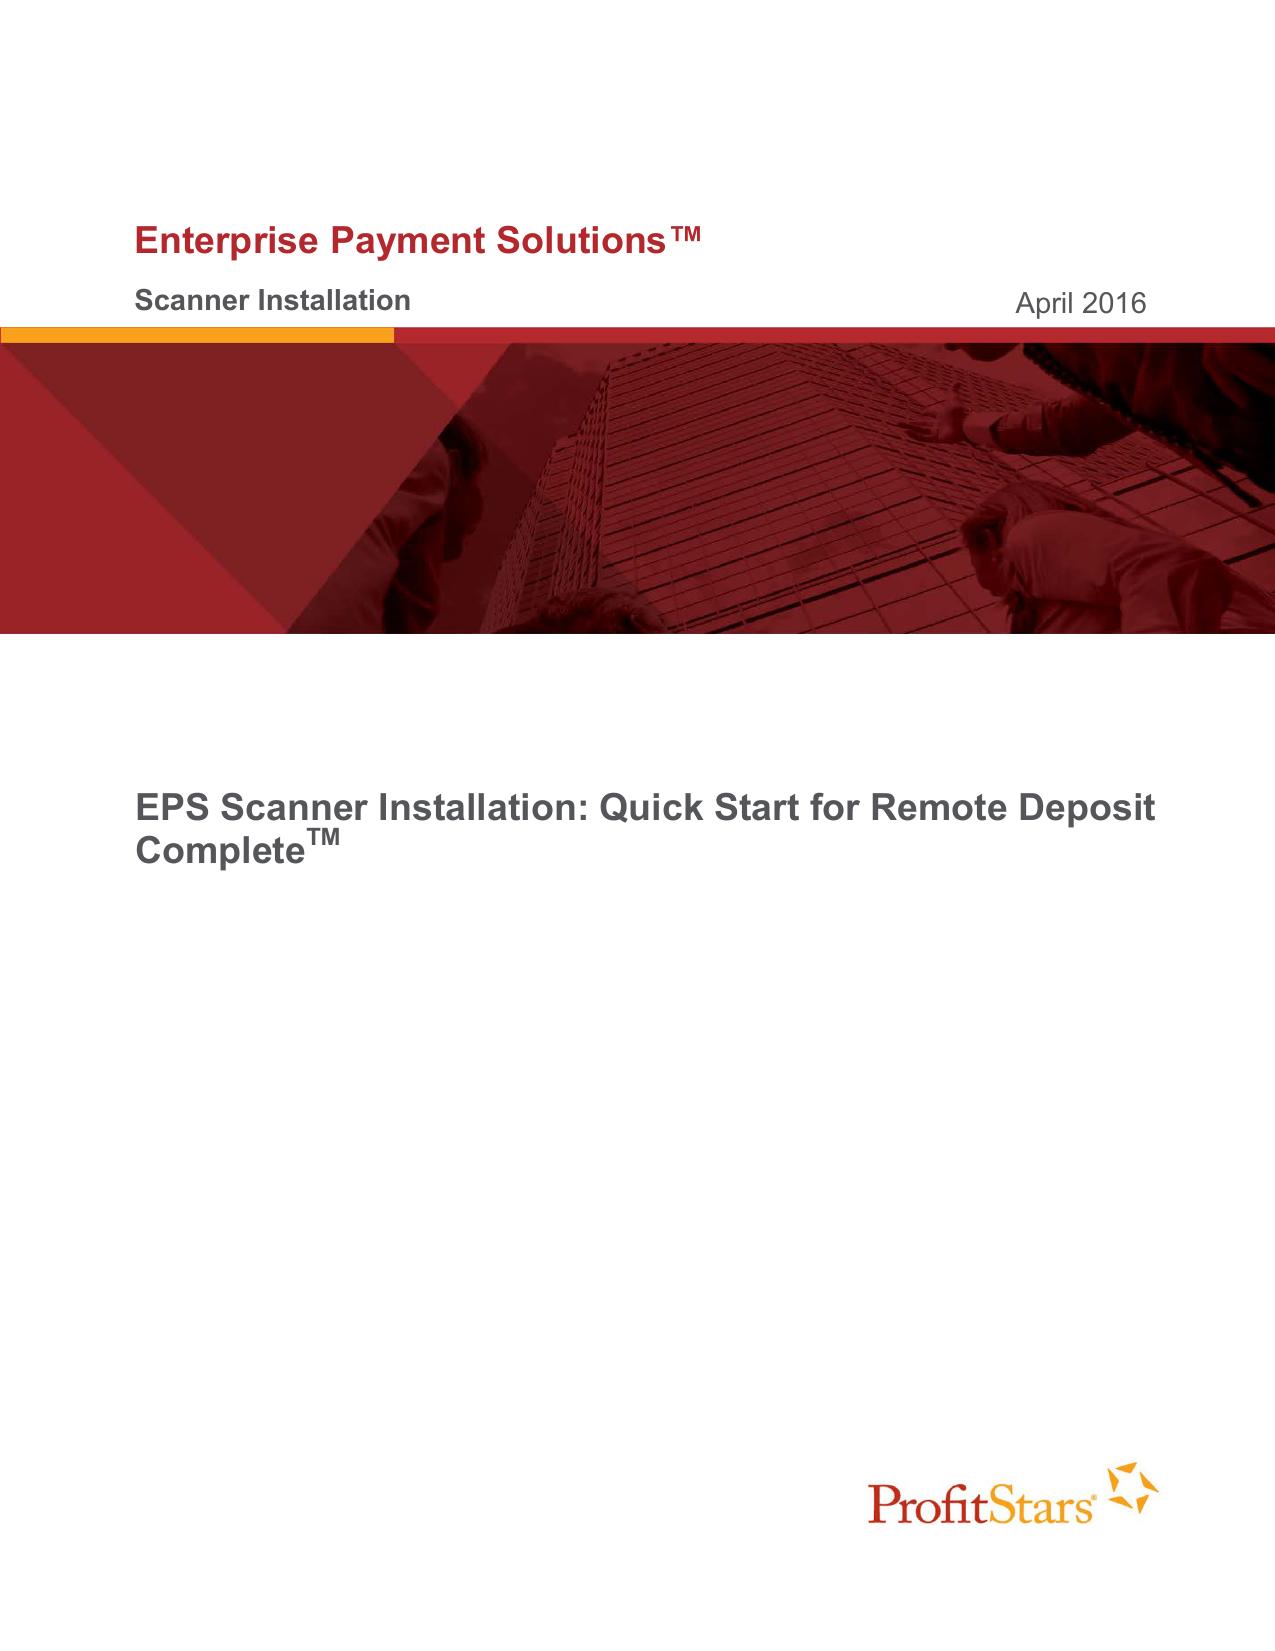 Enterprise Payment Solutions™ EPS Scanner Installation: Quick